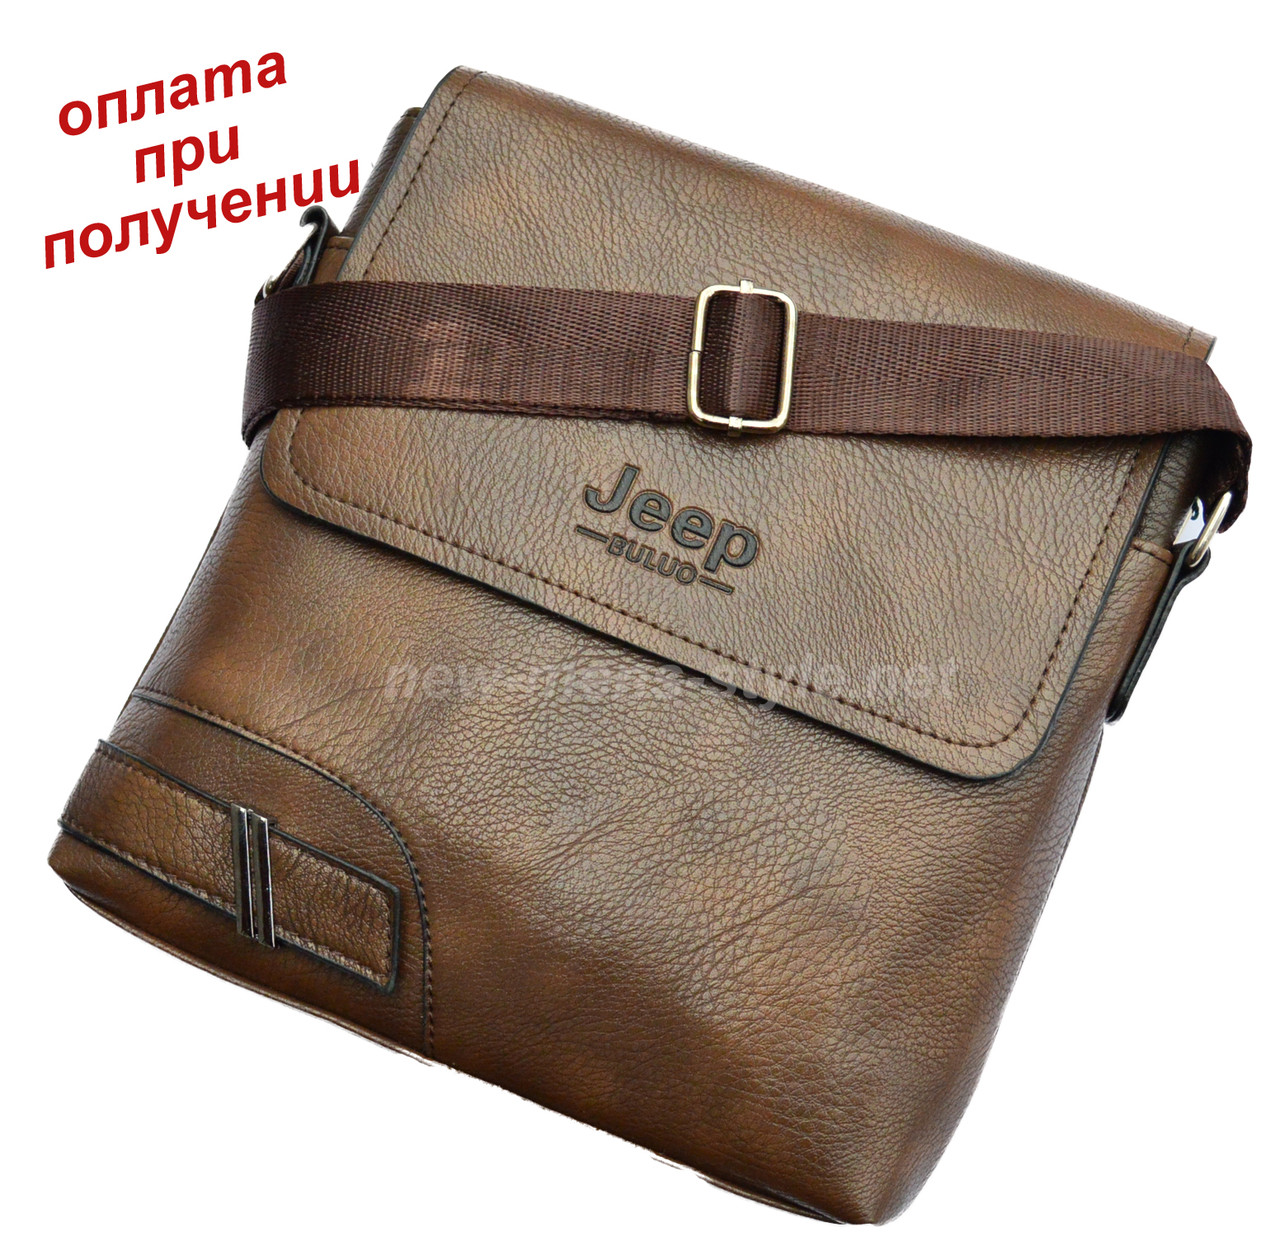 Мужская стильная чоловіча кожаная сумка барсетка борсетка JEEP новинка